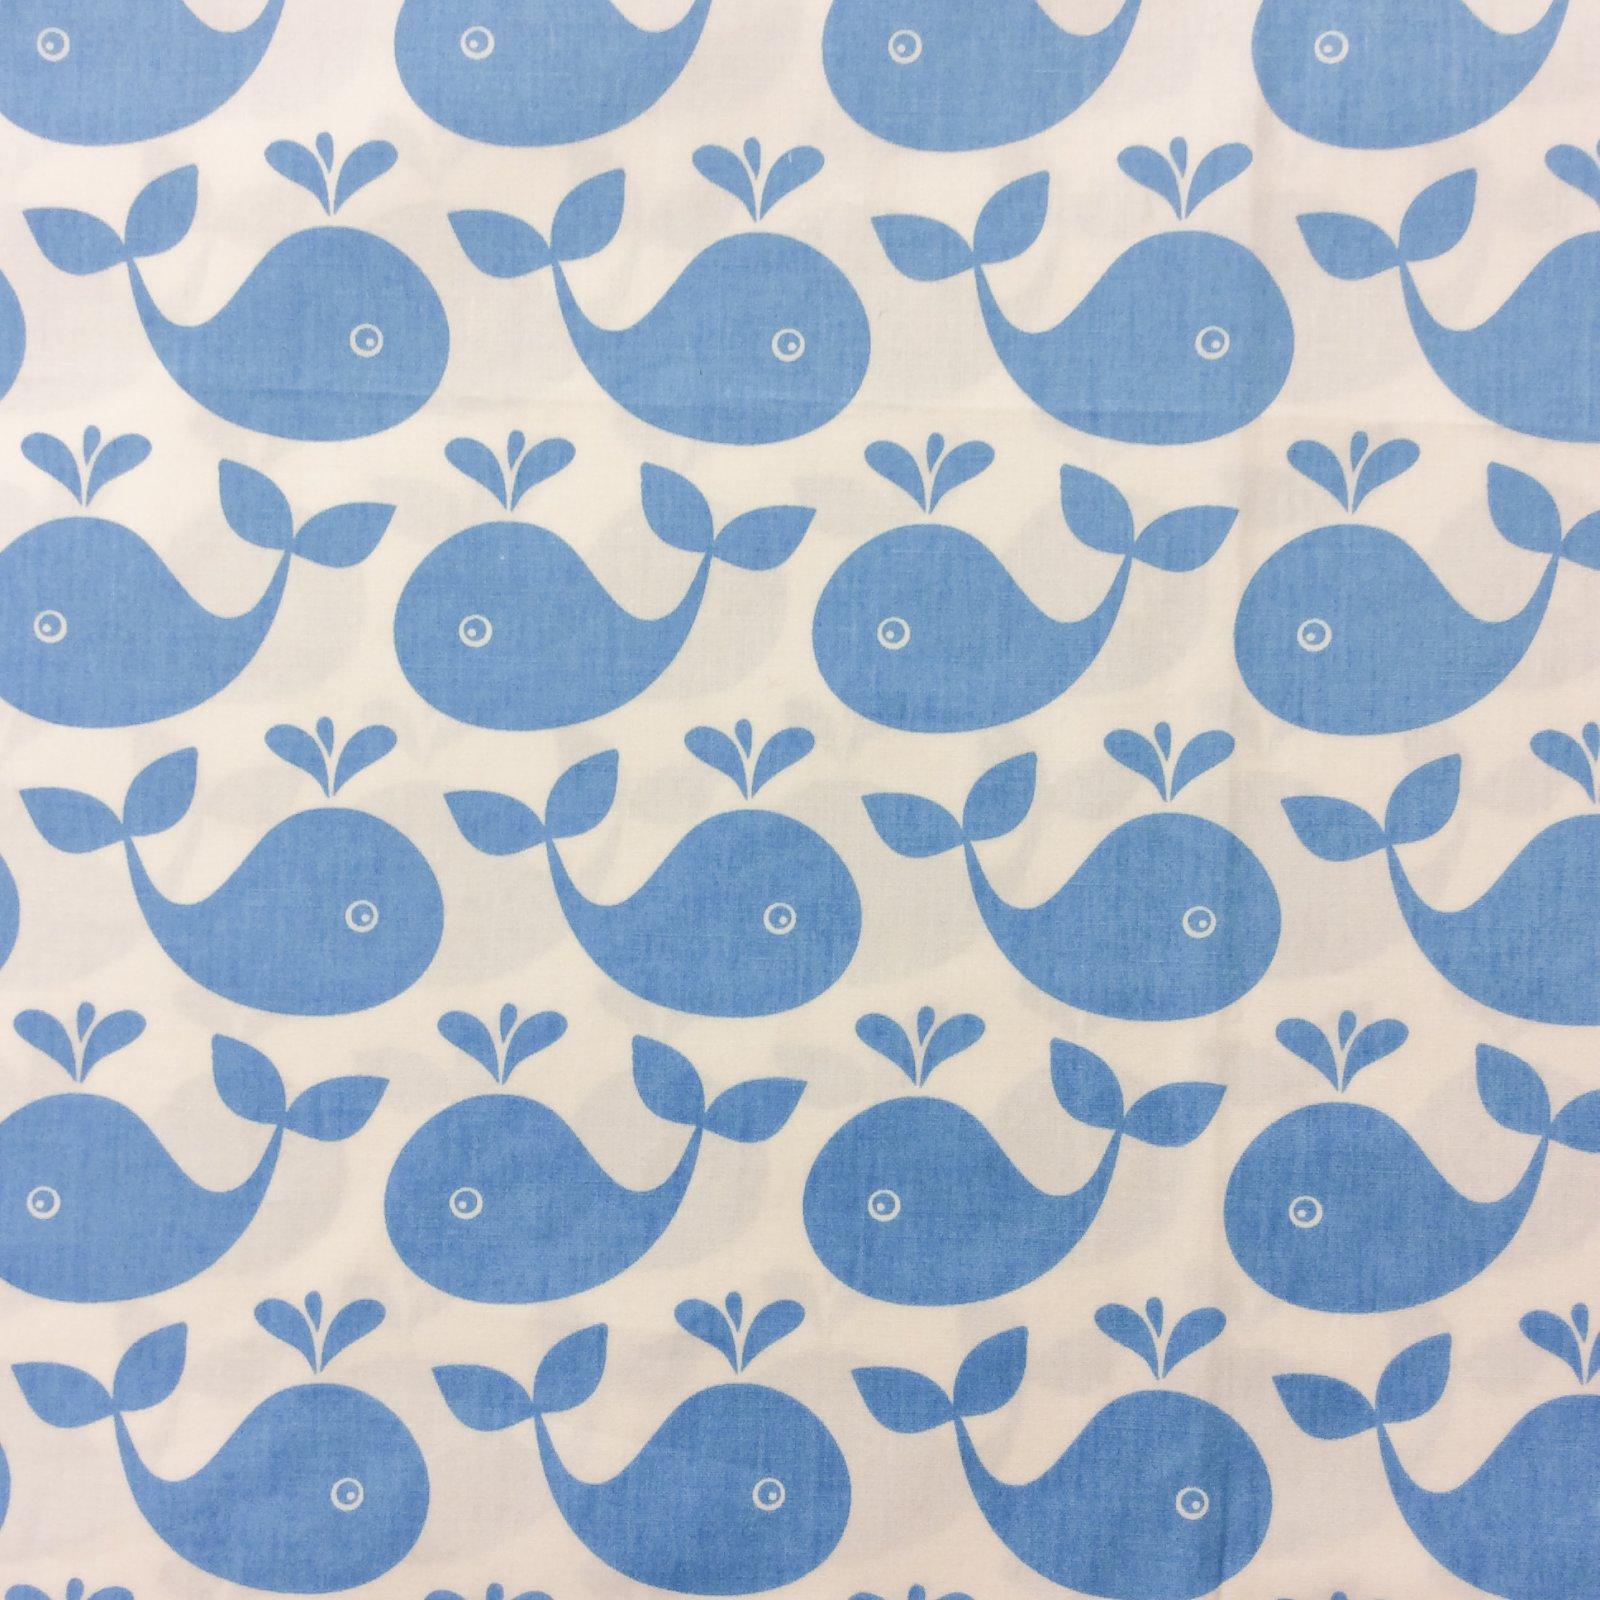 AA11 RARE  Blue White Whales Copenhagen Denmark Retro Cotton Fabric Quilt Fabric